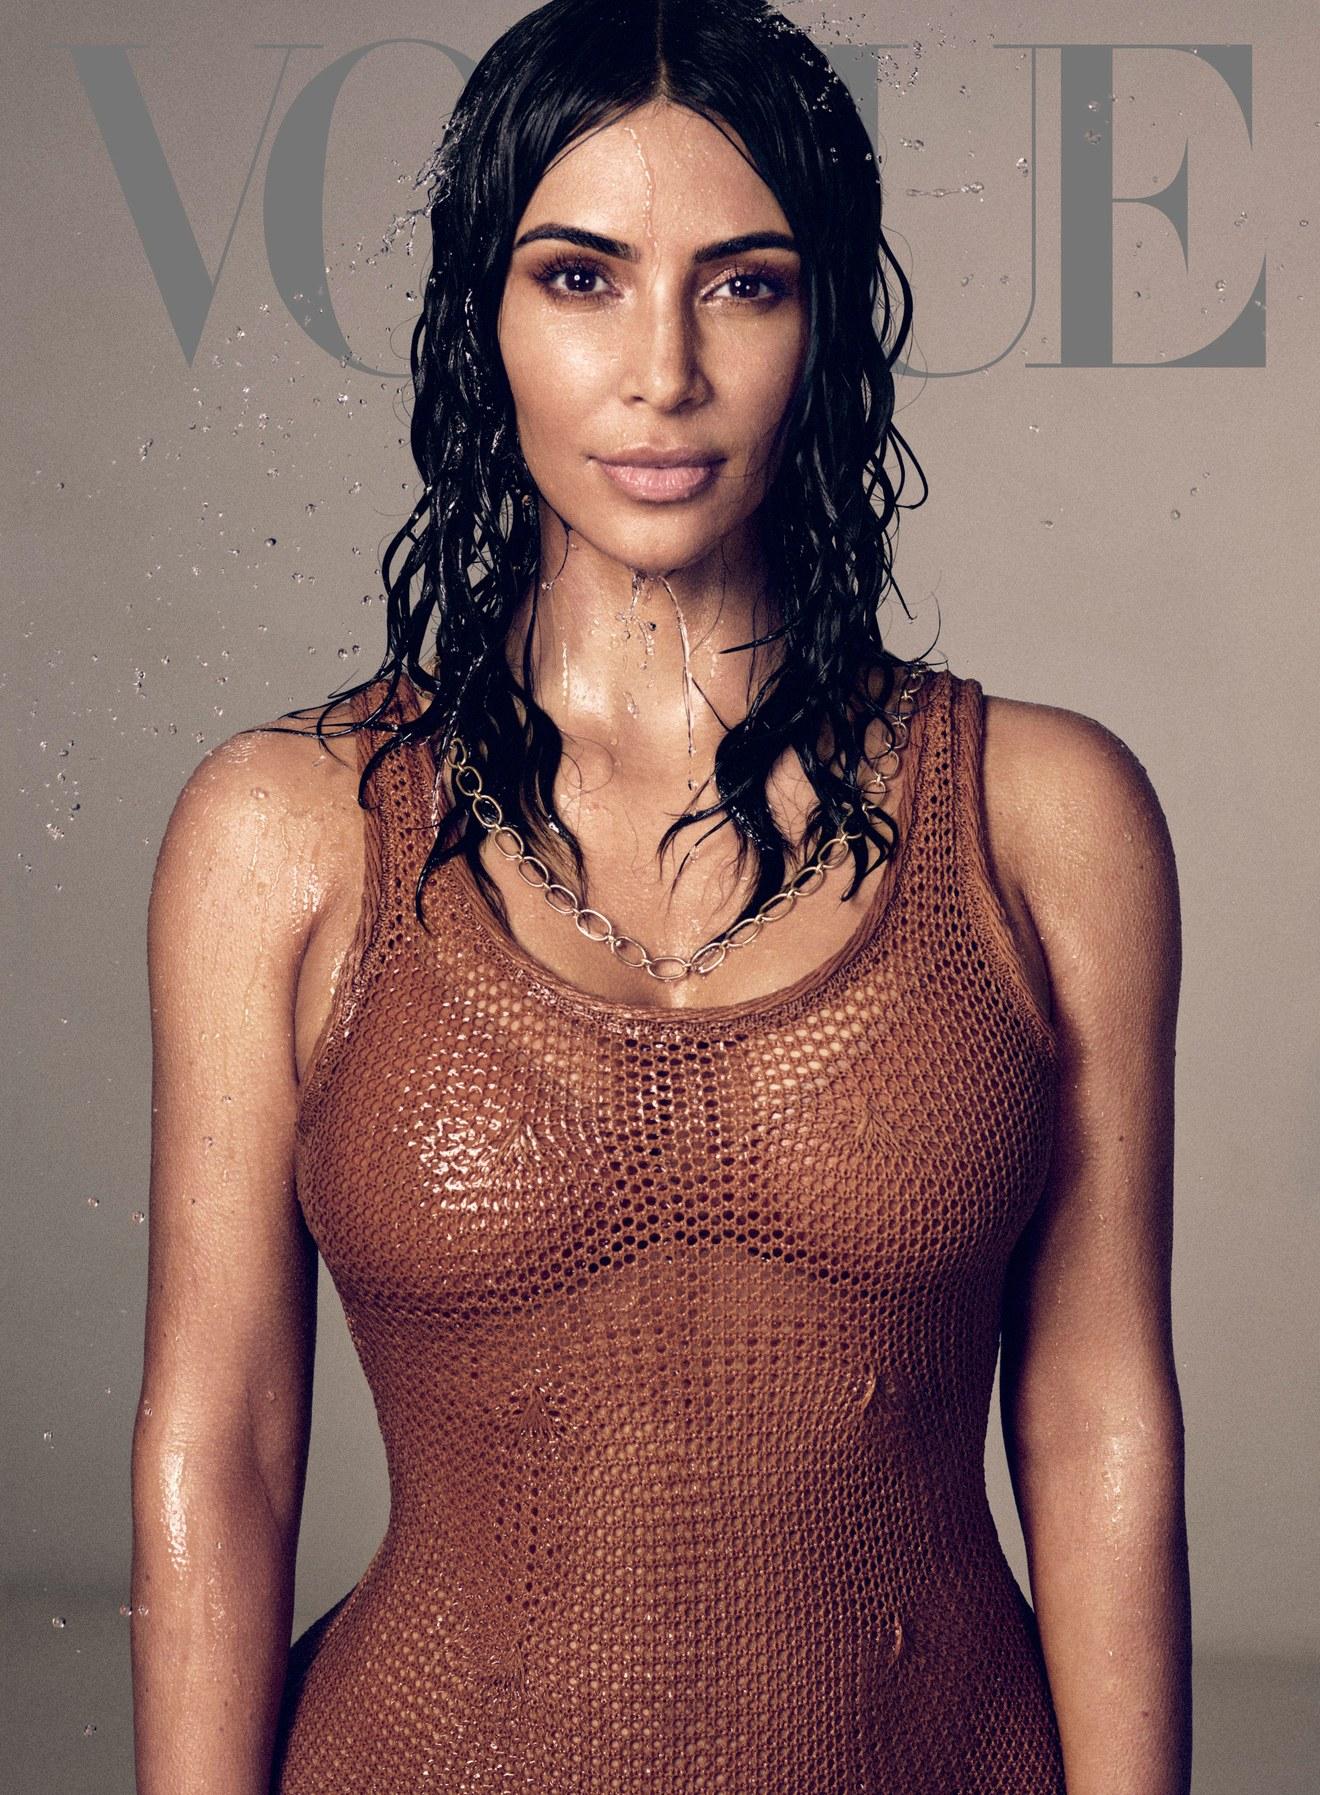 08-kim-kardashian-west-vogue-cover-may-2019